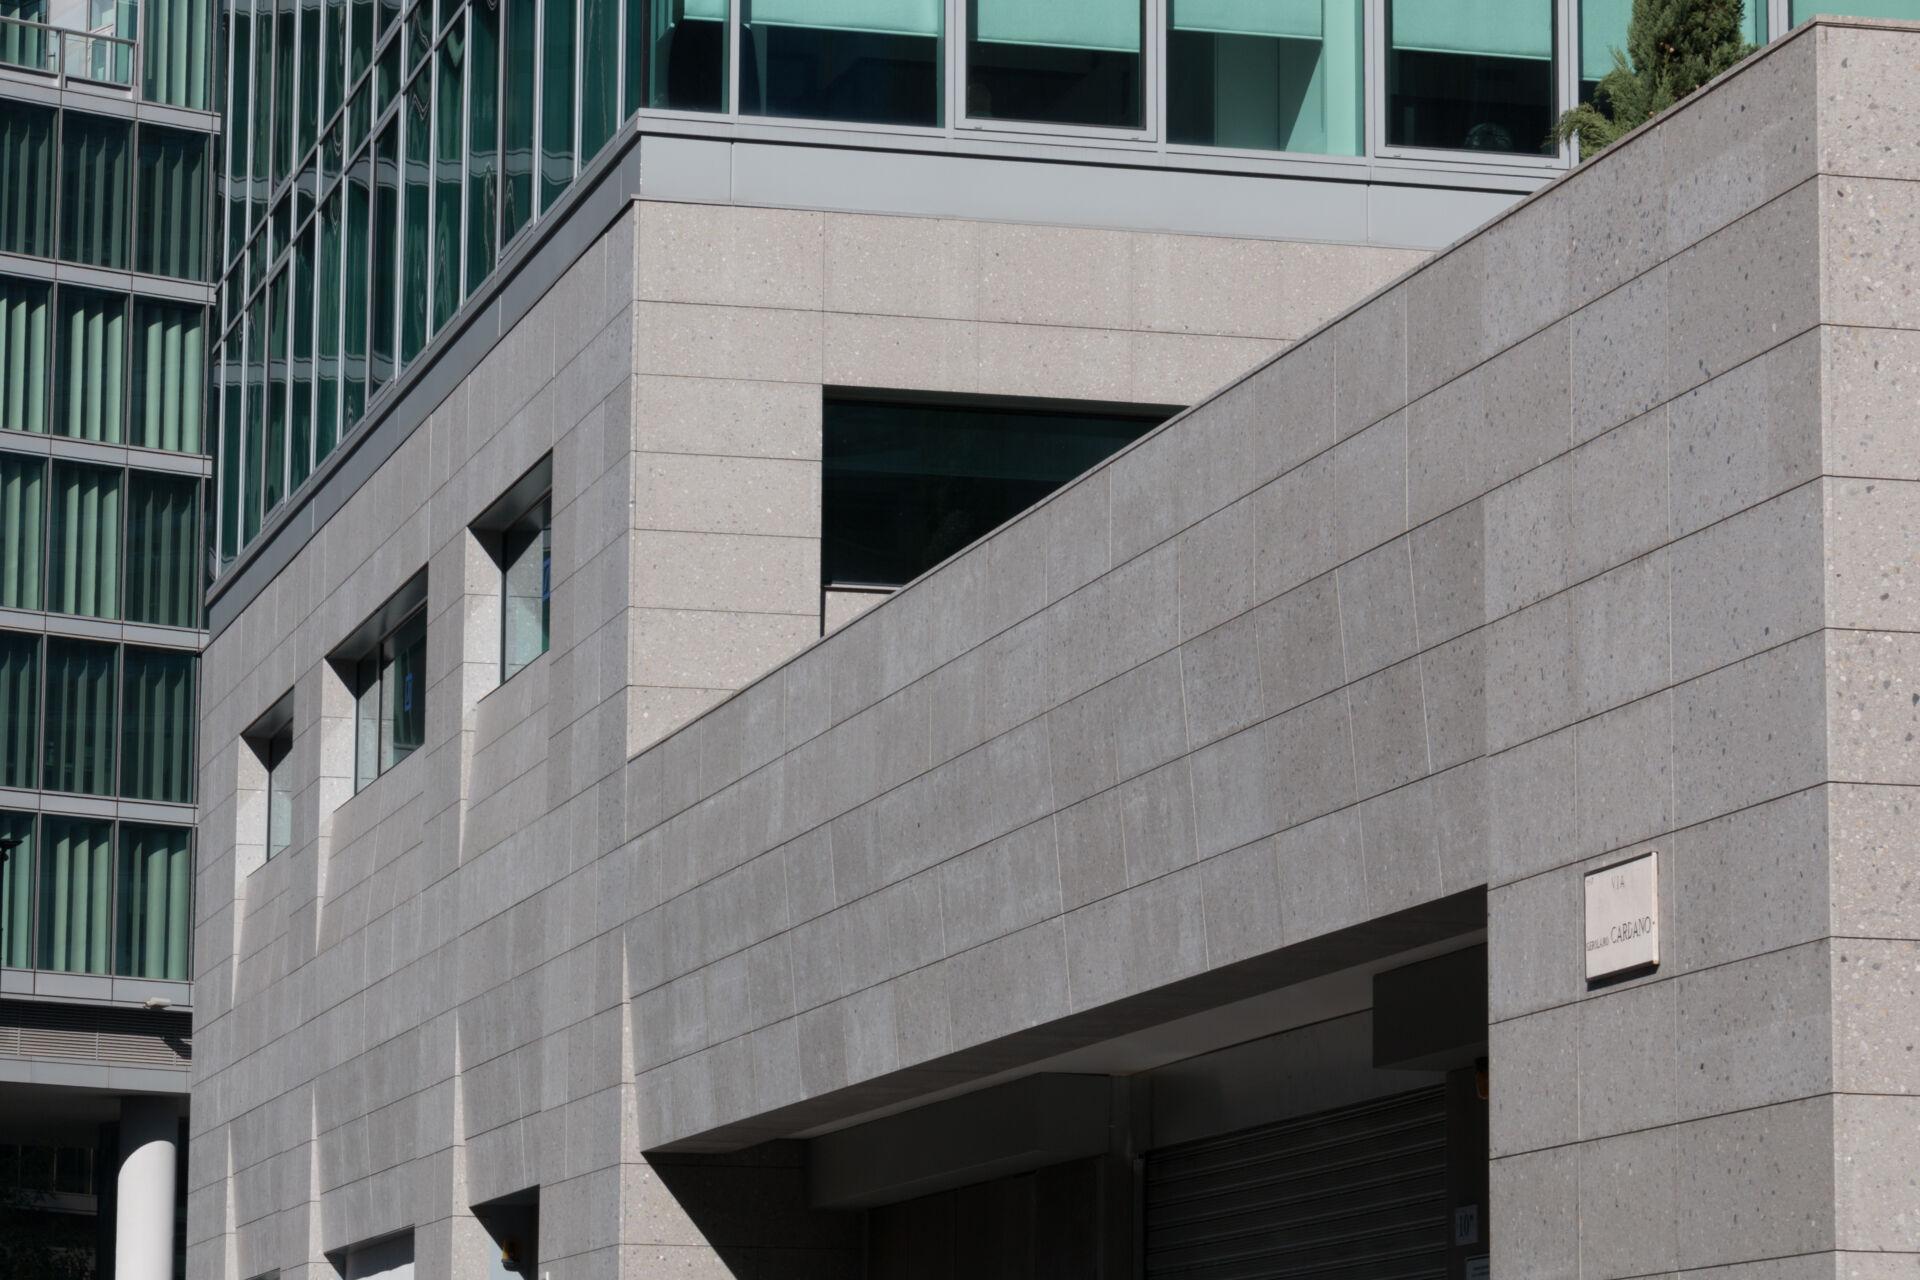 Ventilated facades General Electric